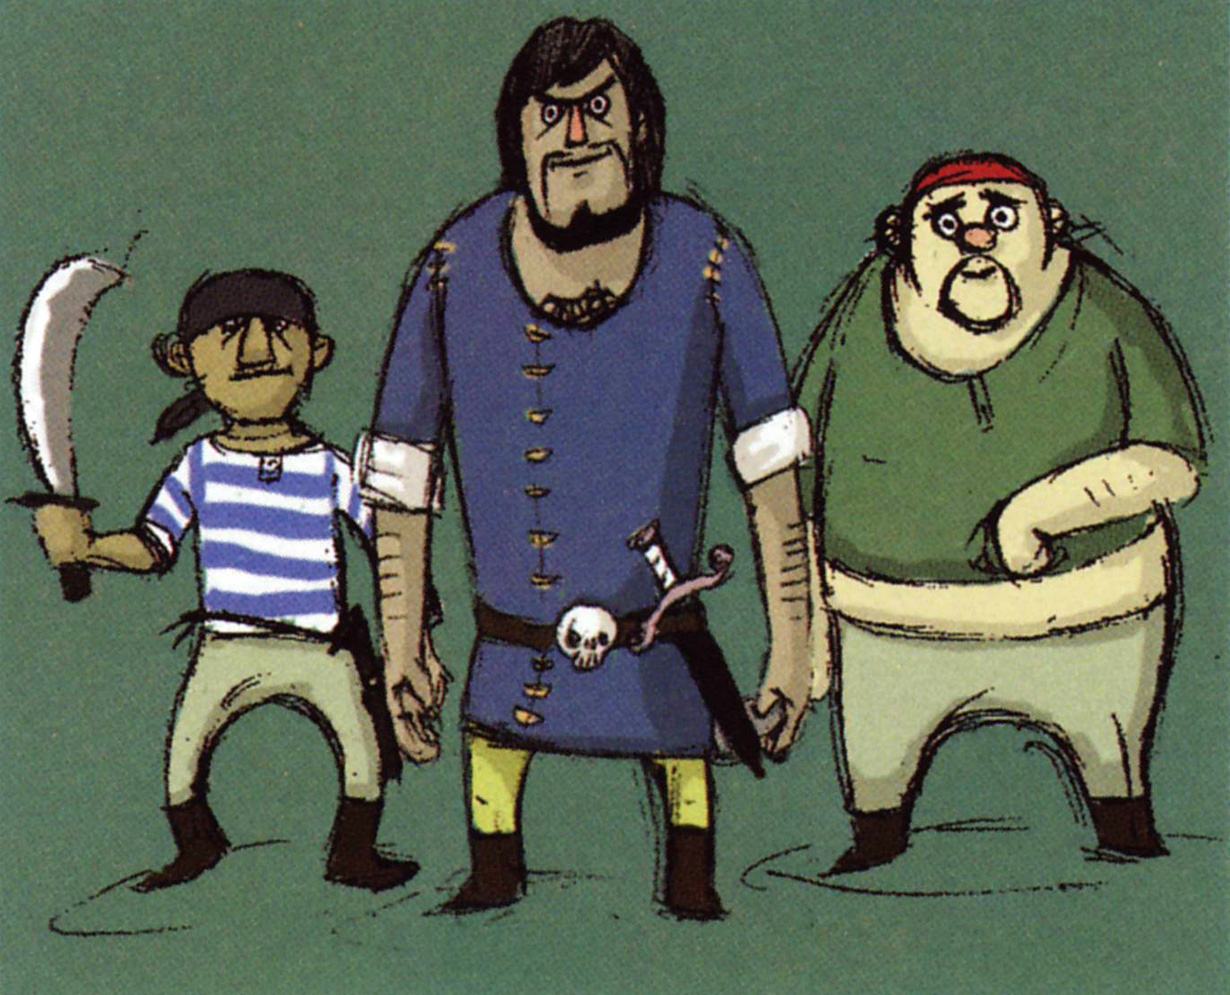 WW Pirate Crew